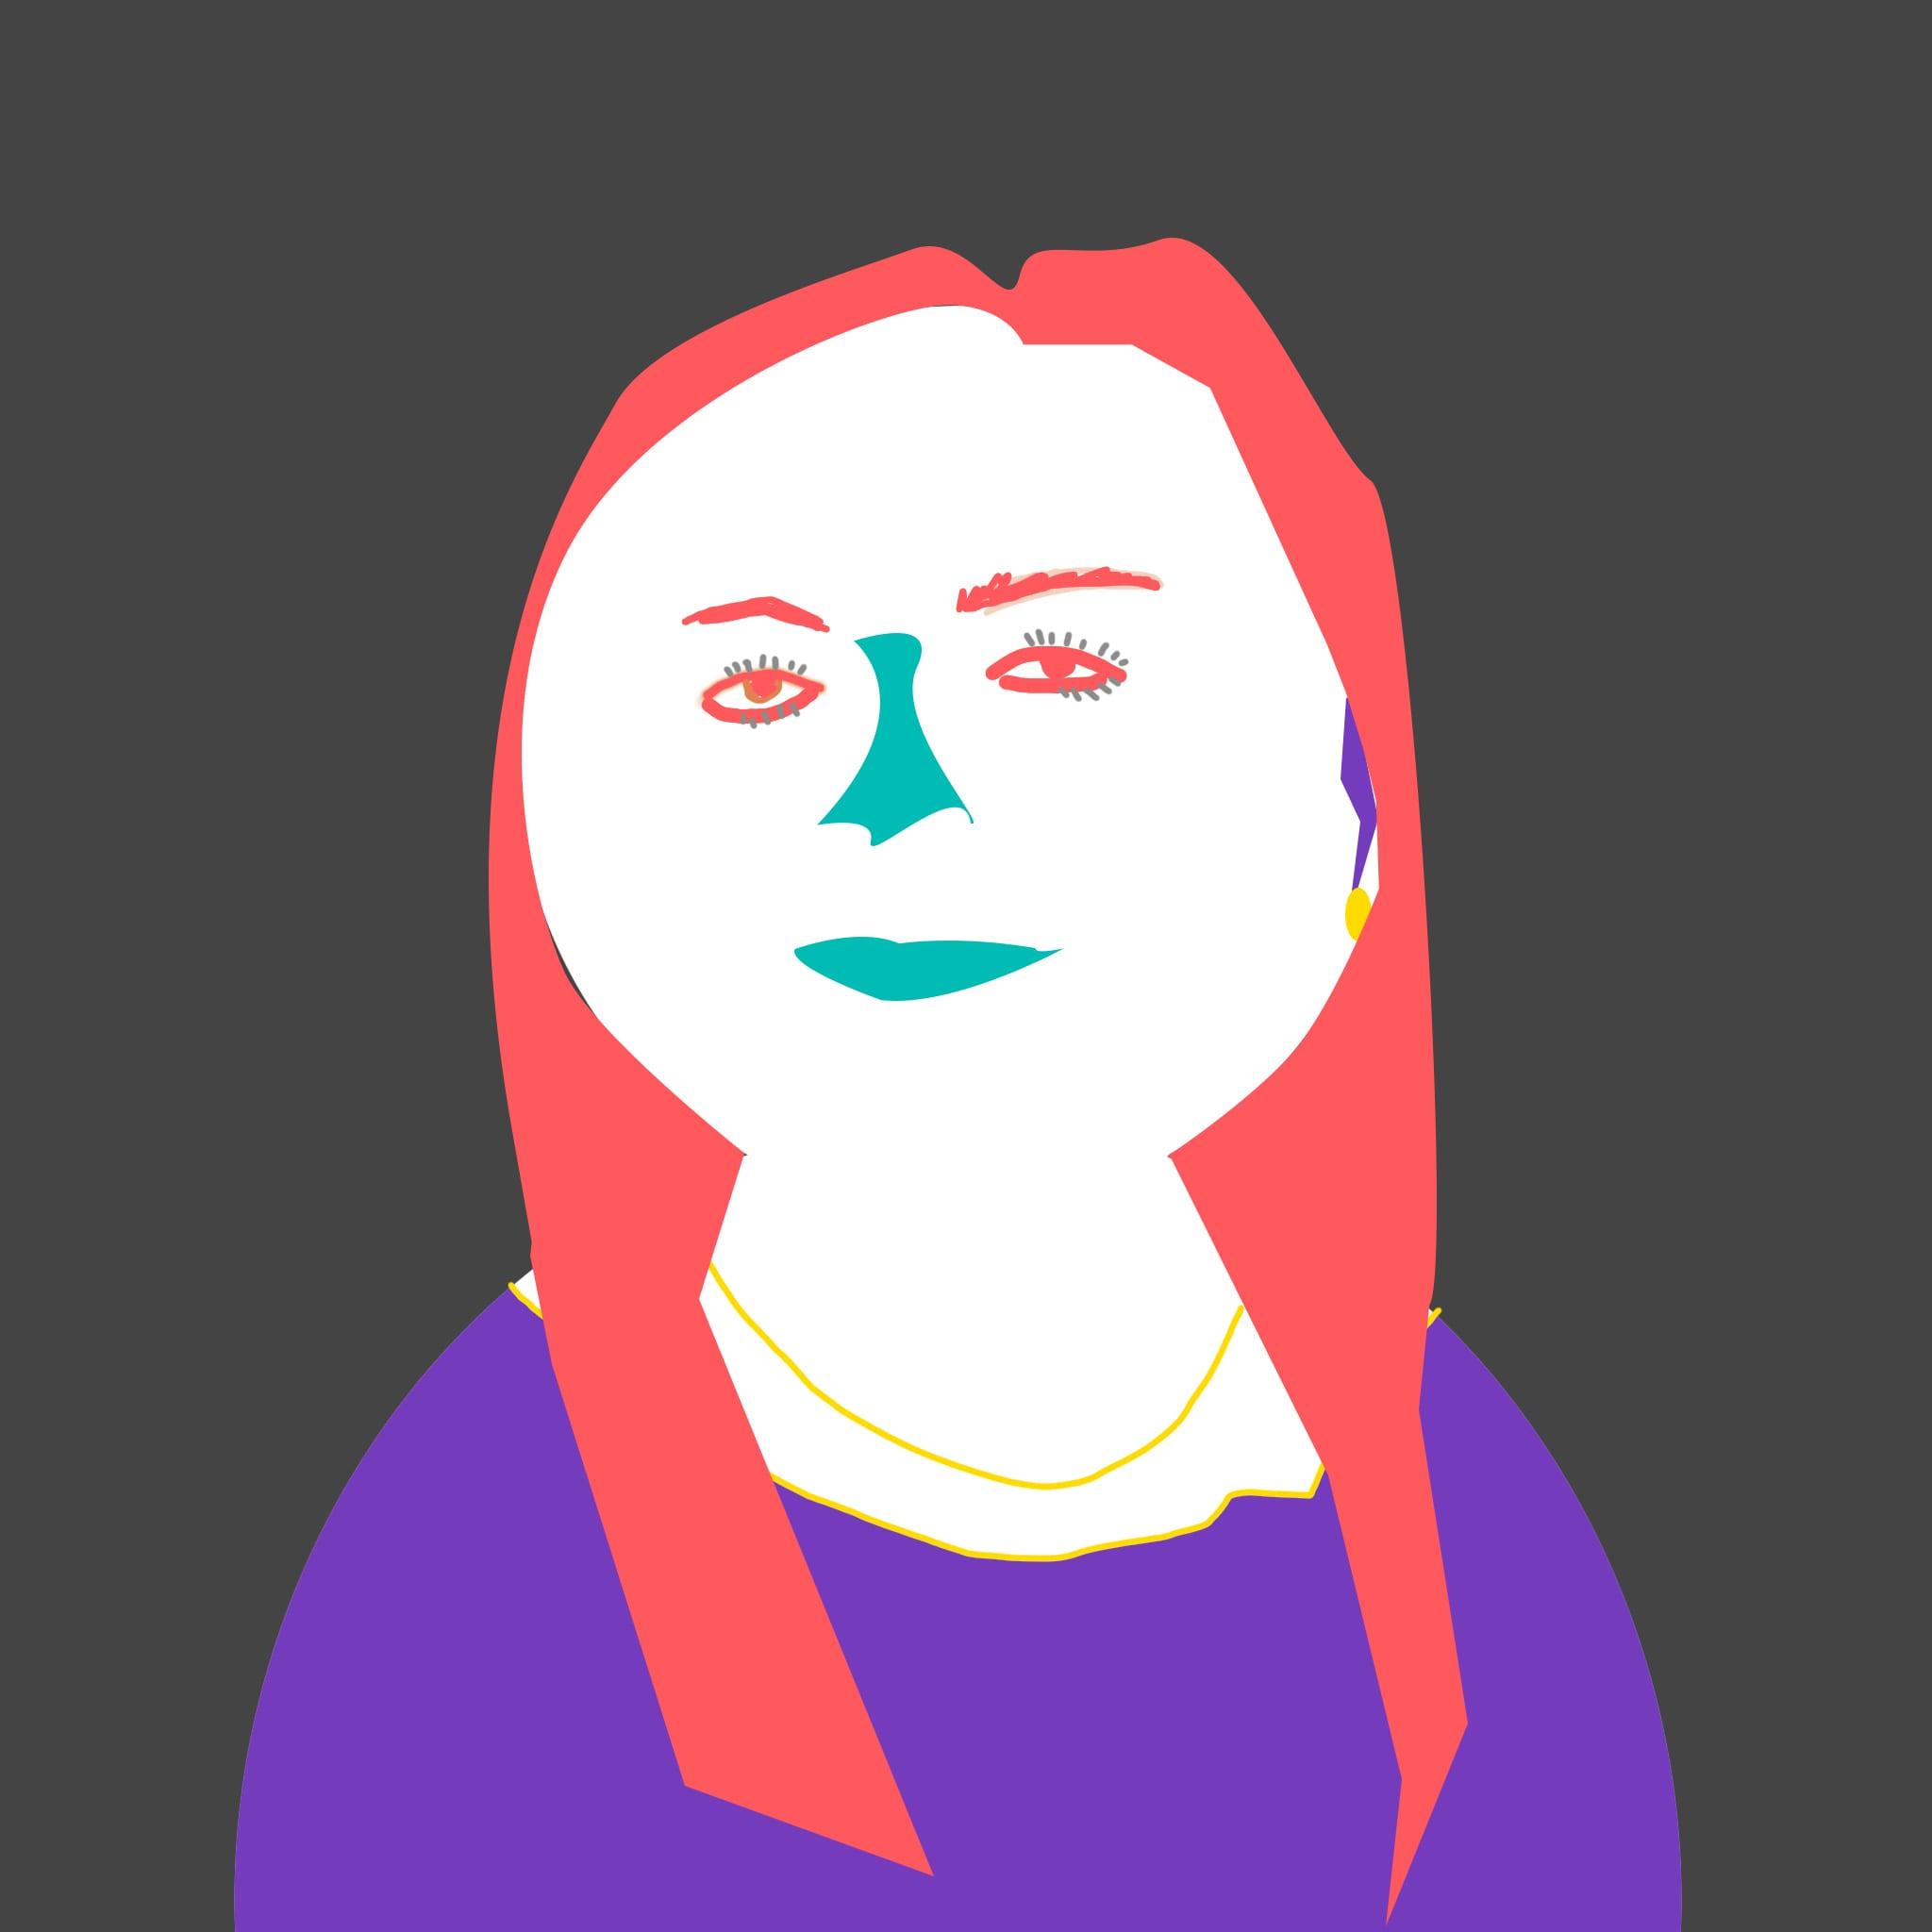 Yulia drawn headshot